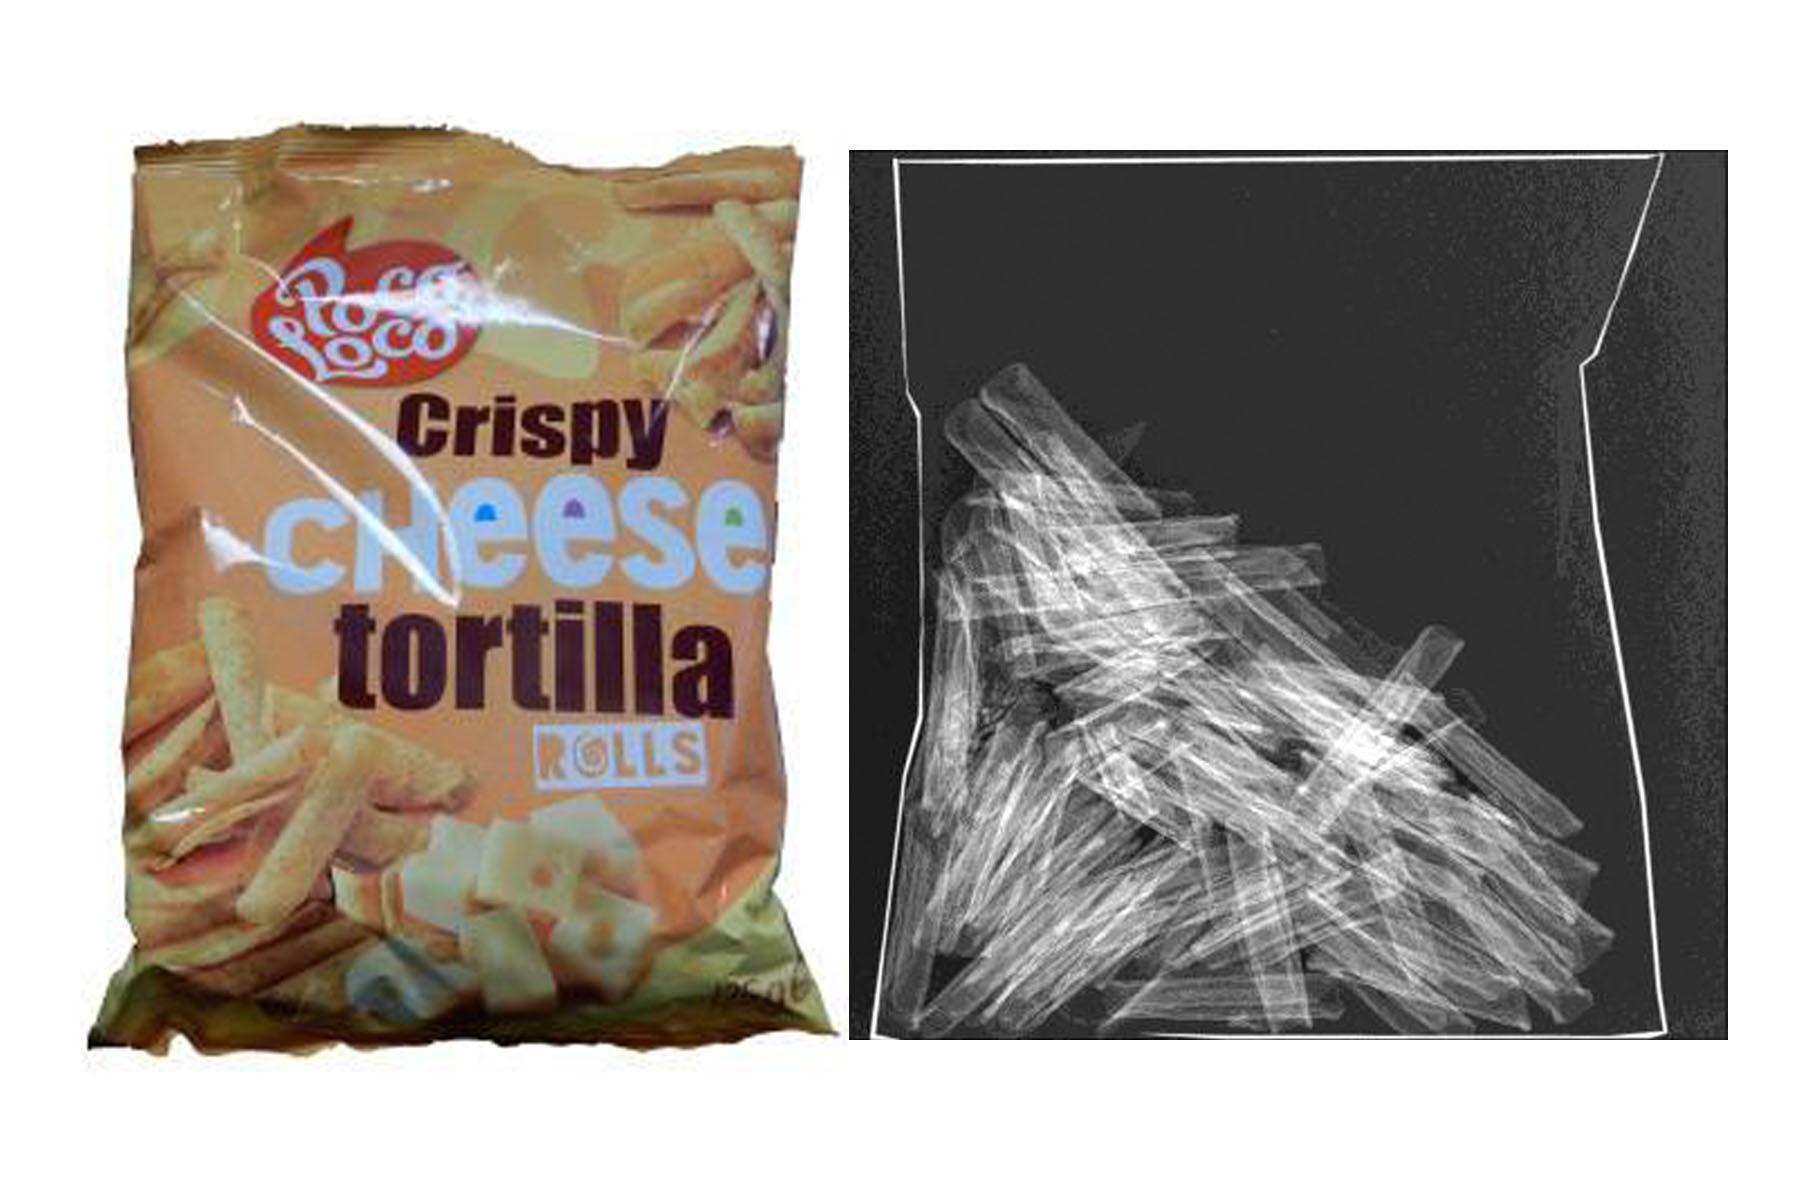 Crispy Cheese Tortilla Rolls